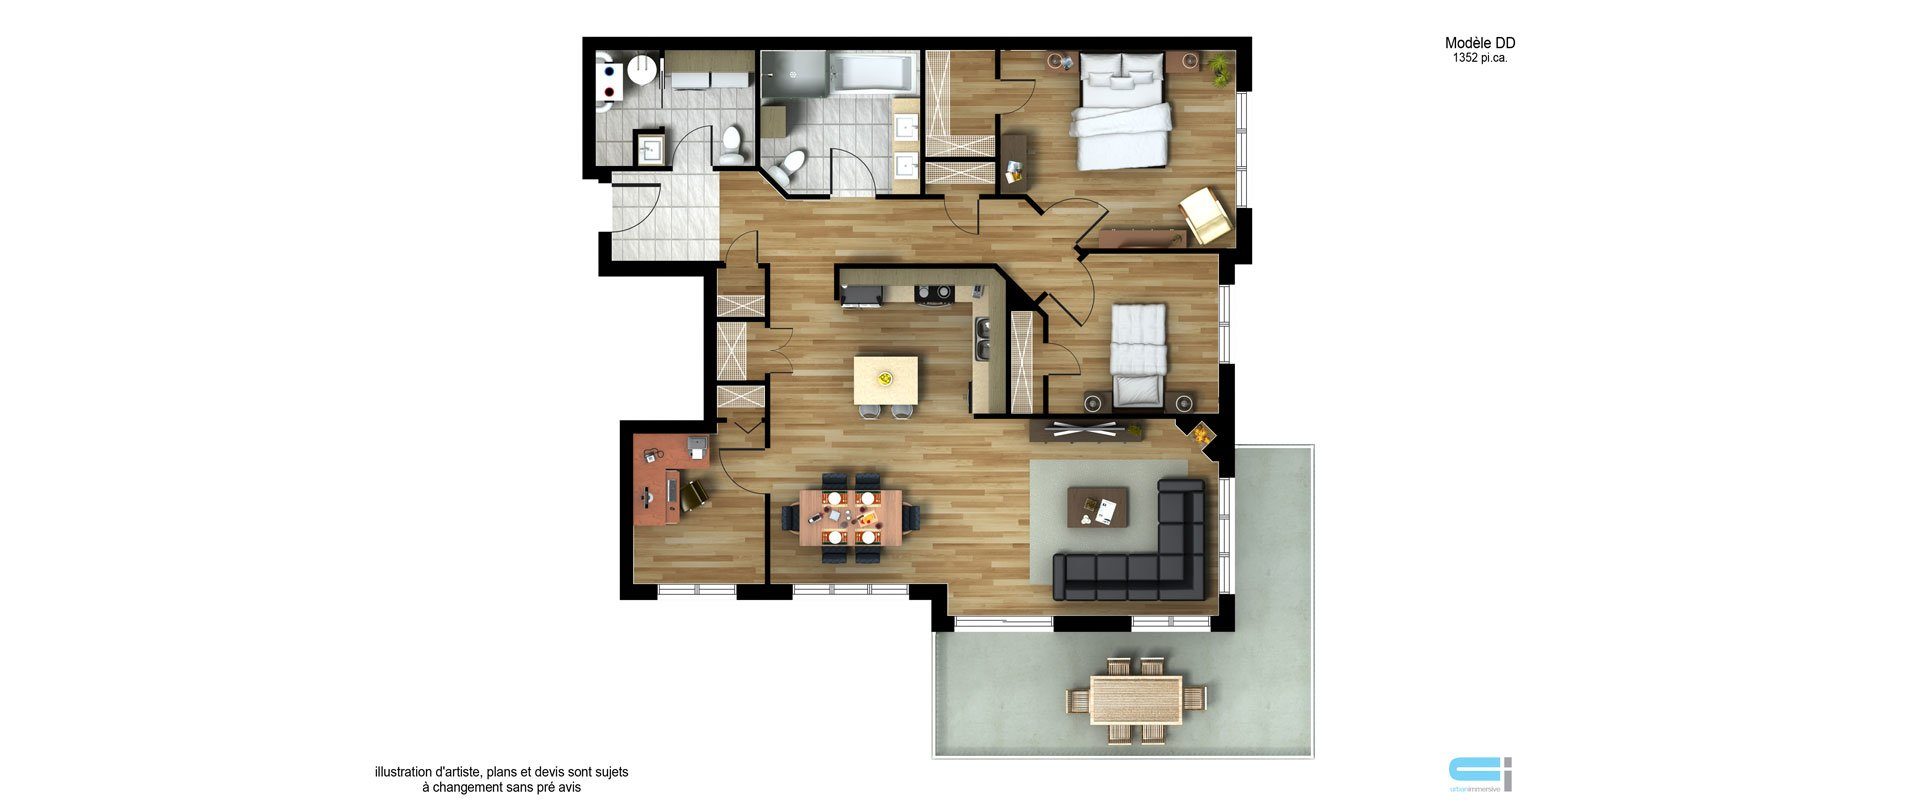 Les Habitations Innovatel condos neufs X15 Mirabel modèle DD